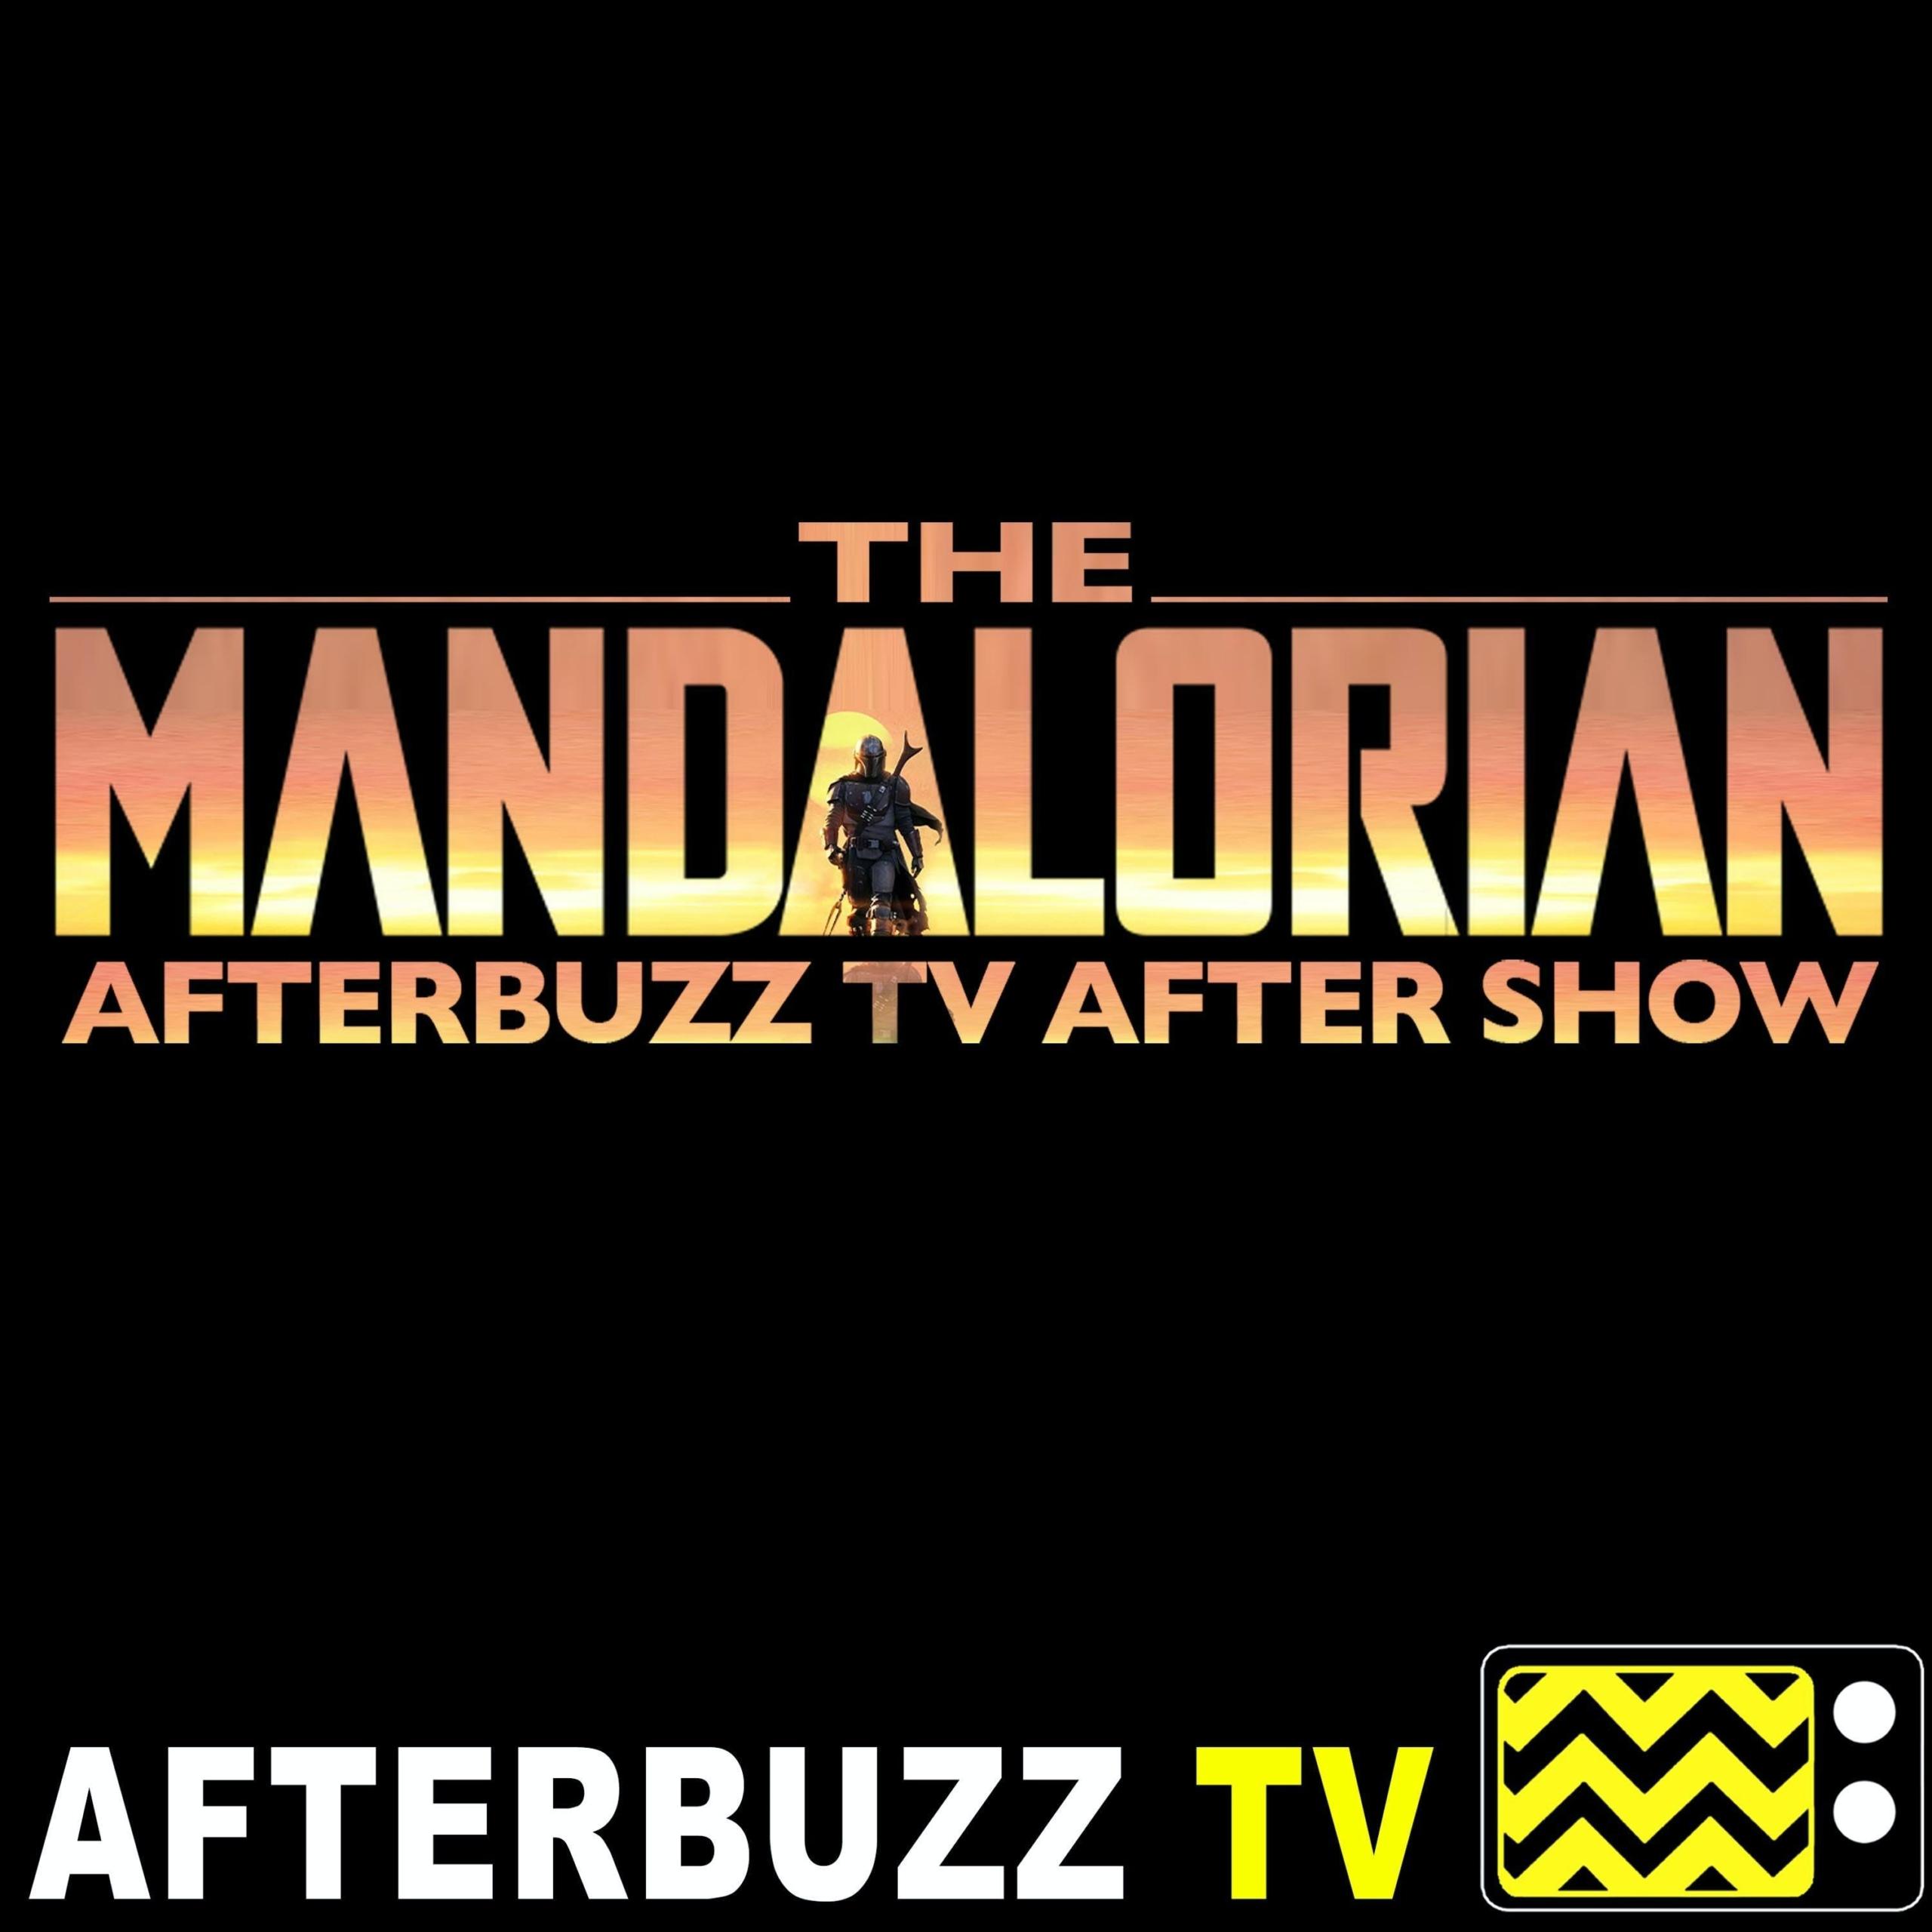 """Redemption"" Season 1 Episode 8 'The Mandalorian' Review"